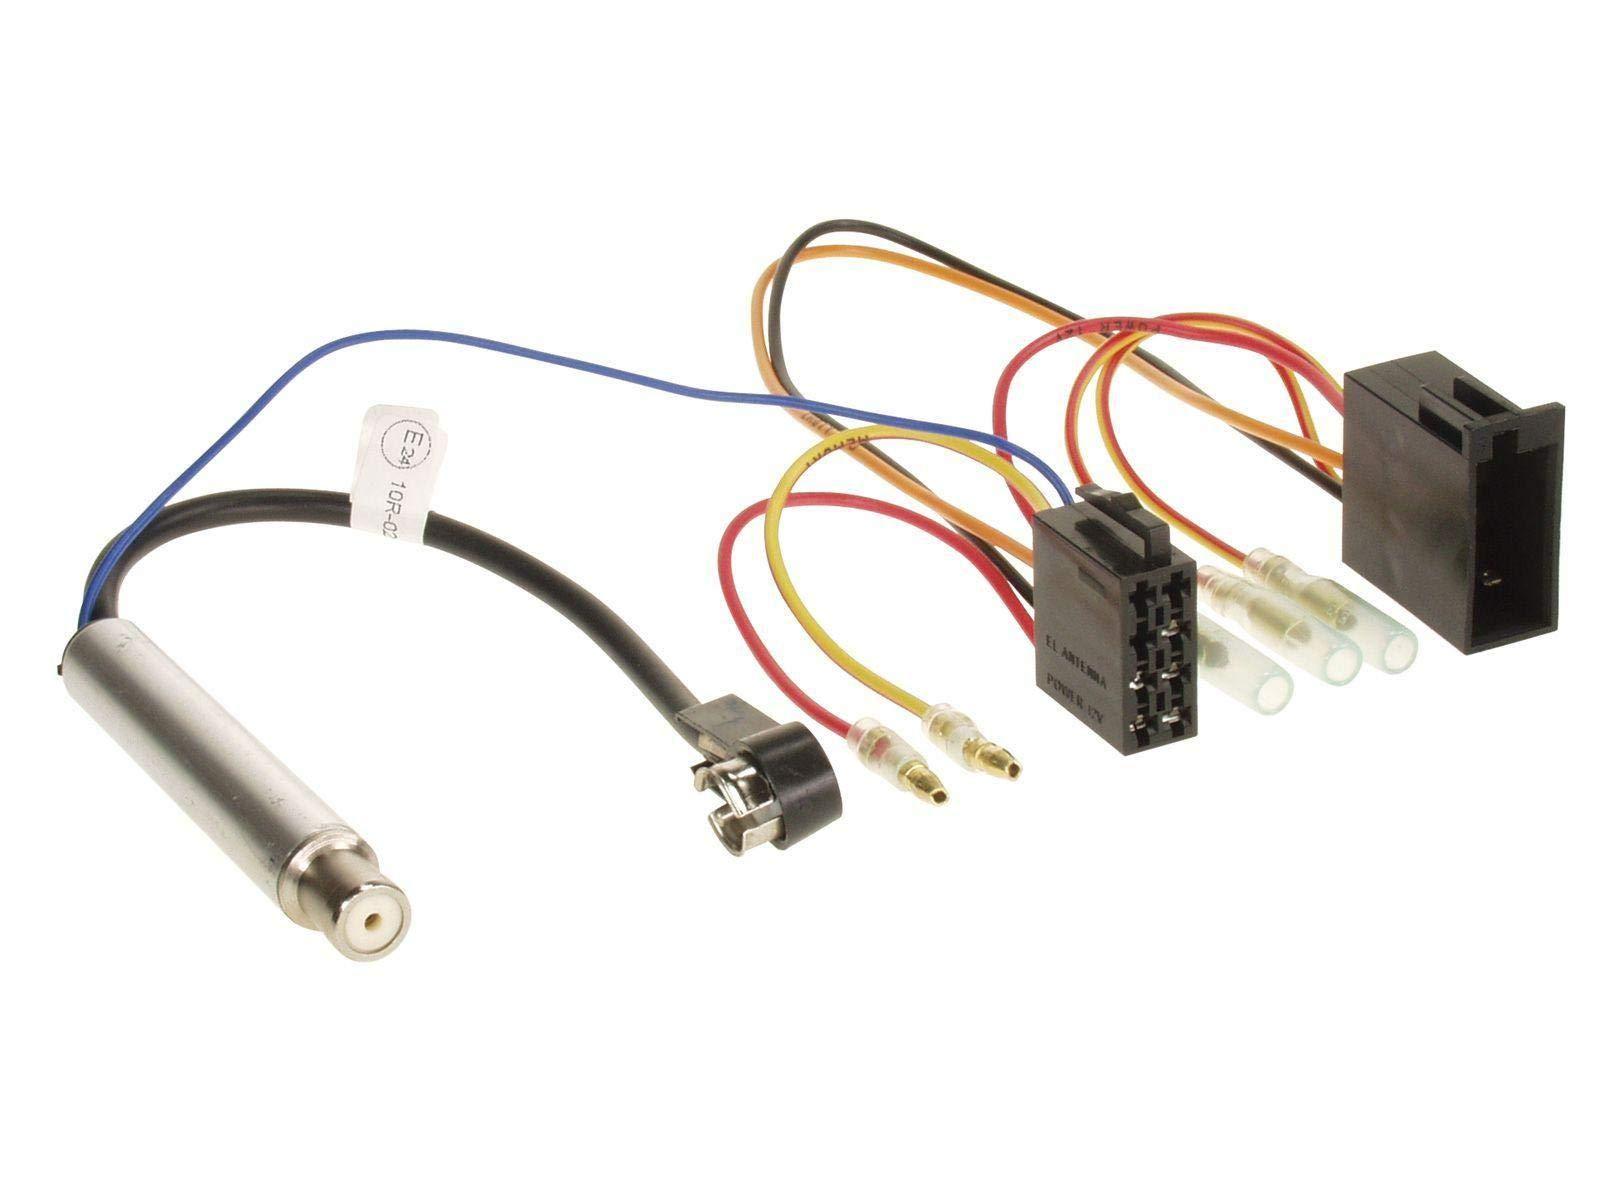 Pioneer-MVH-S110UB-AUX-MP3-USB-1DIN-Autoradio-fr-Audi-A4-B5-bis-99-A6-C4-bis-97-A8-D2-bis-99